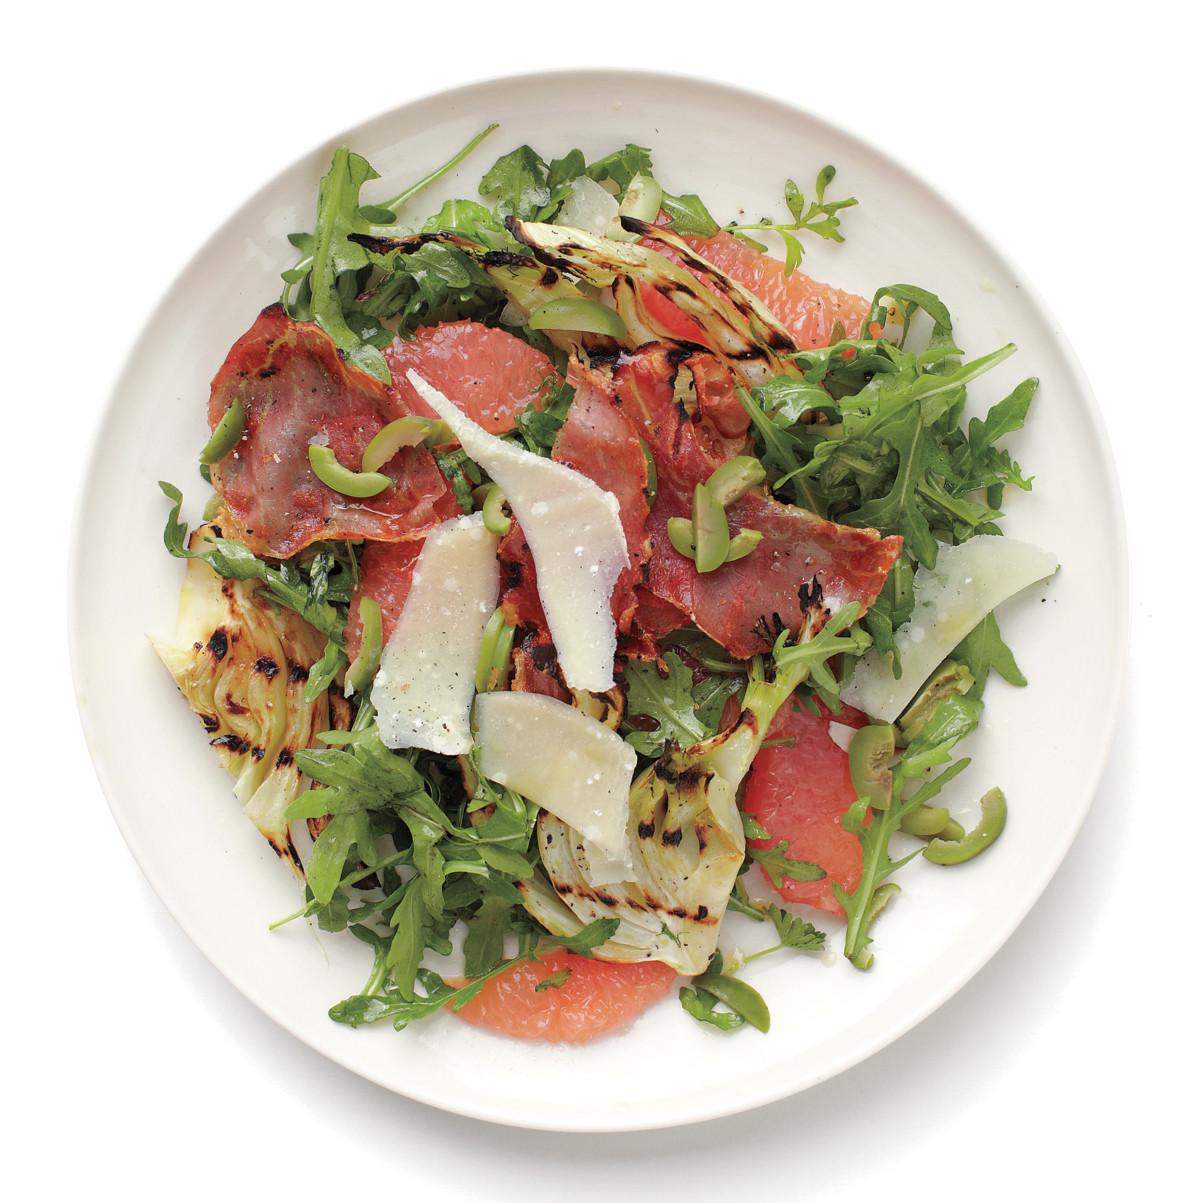 Grapefruit and Grilled Fennel Salad